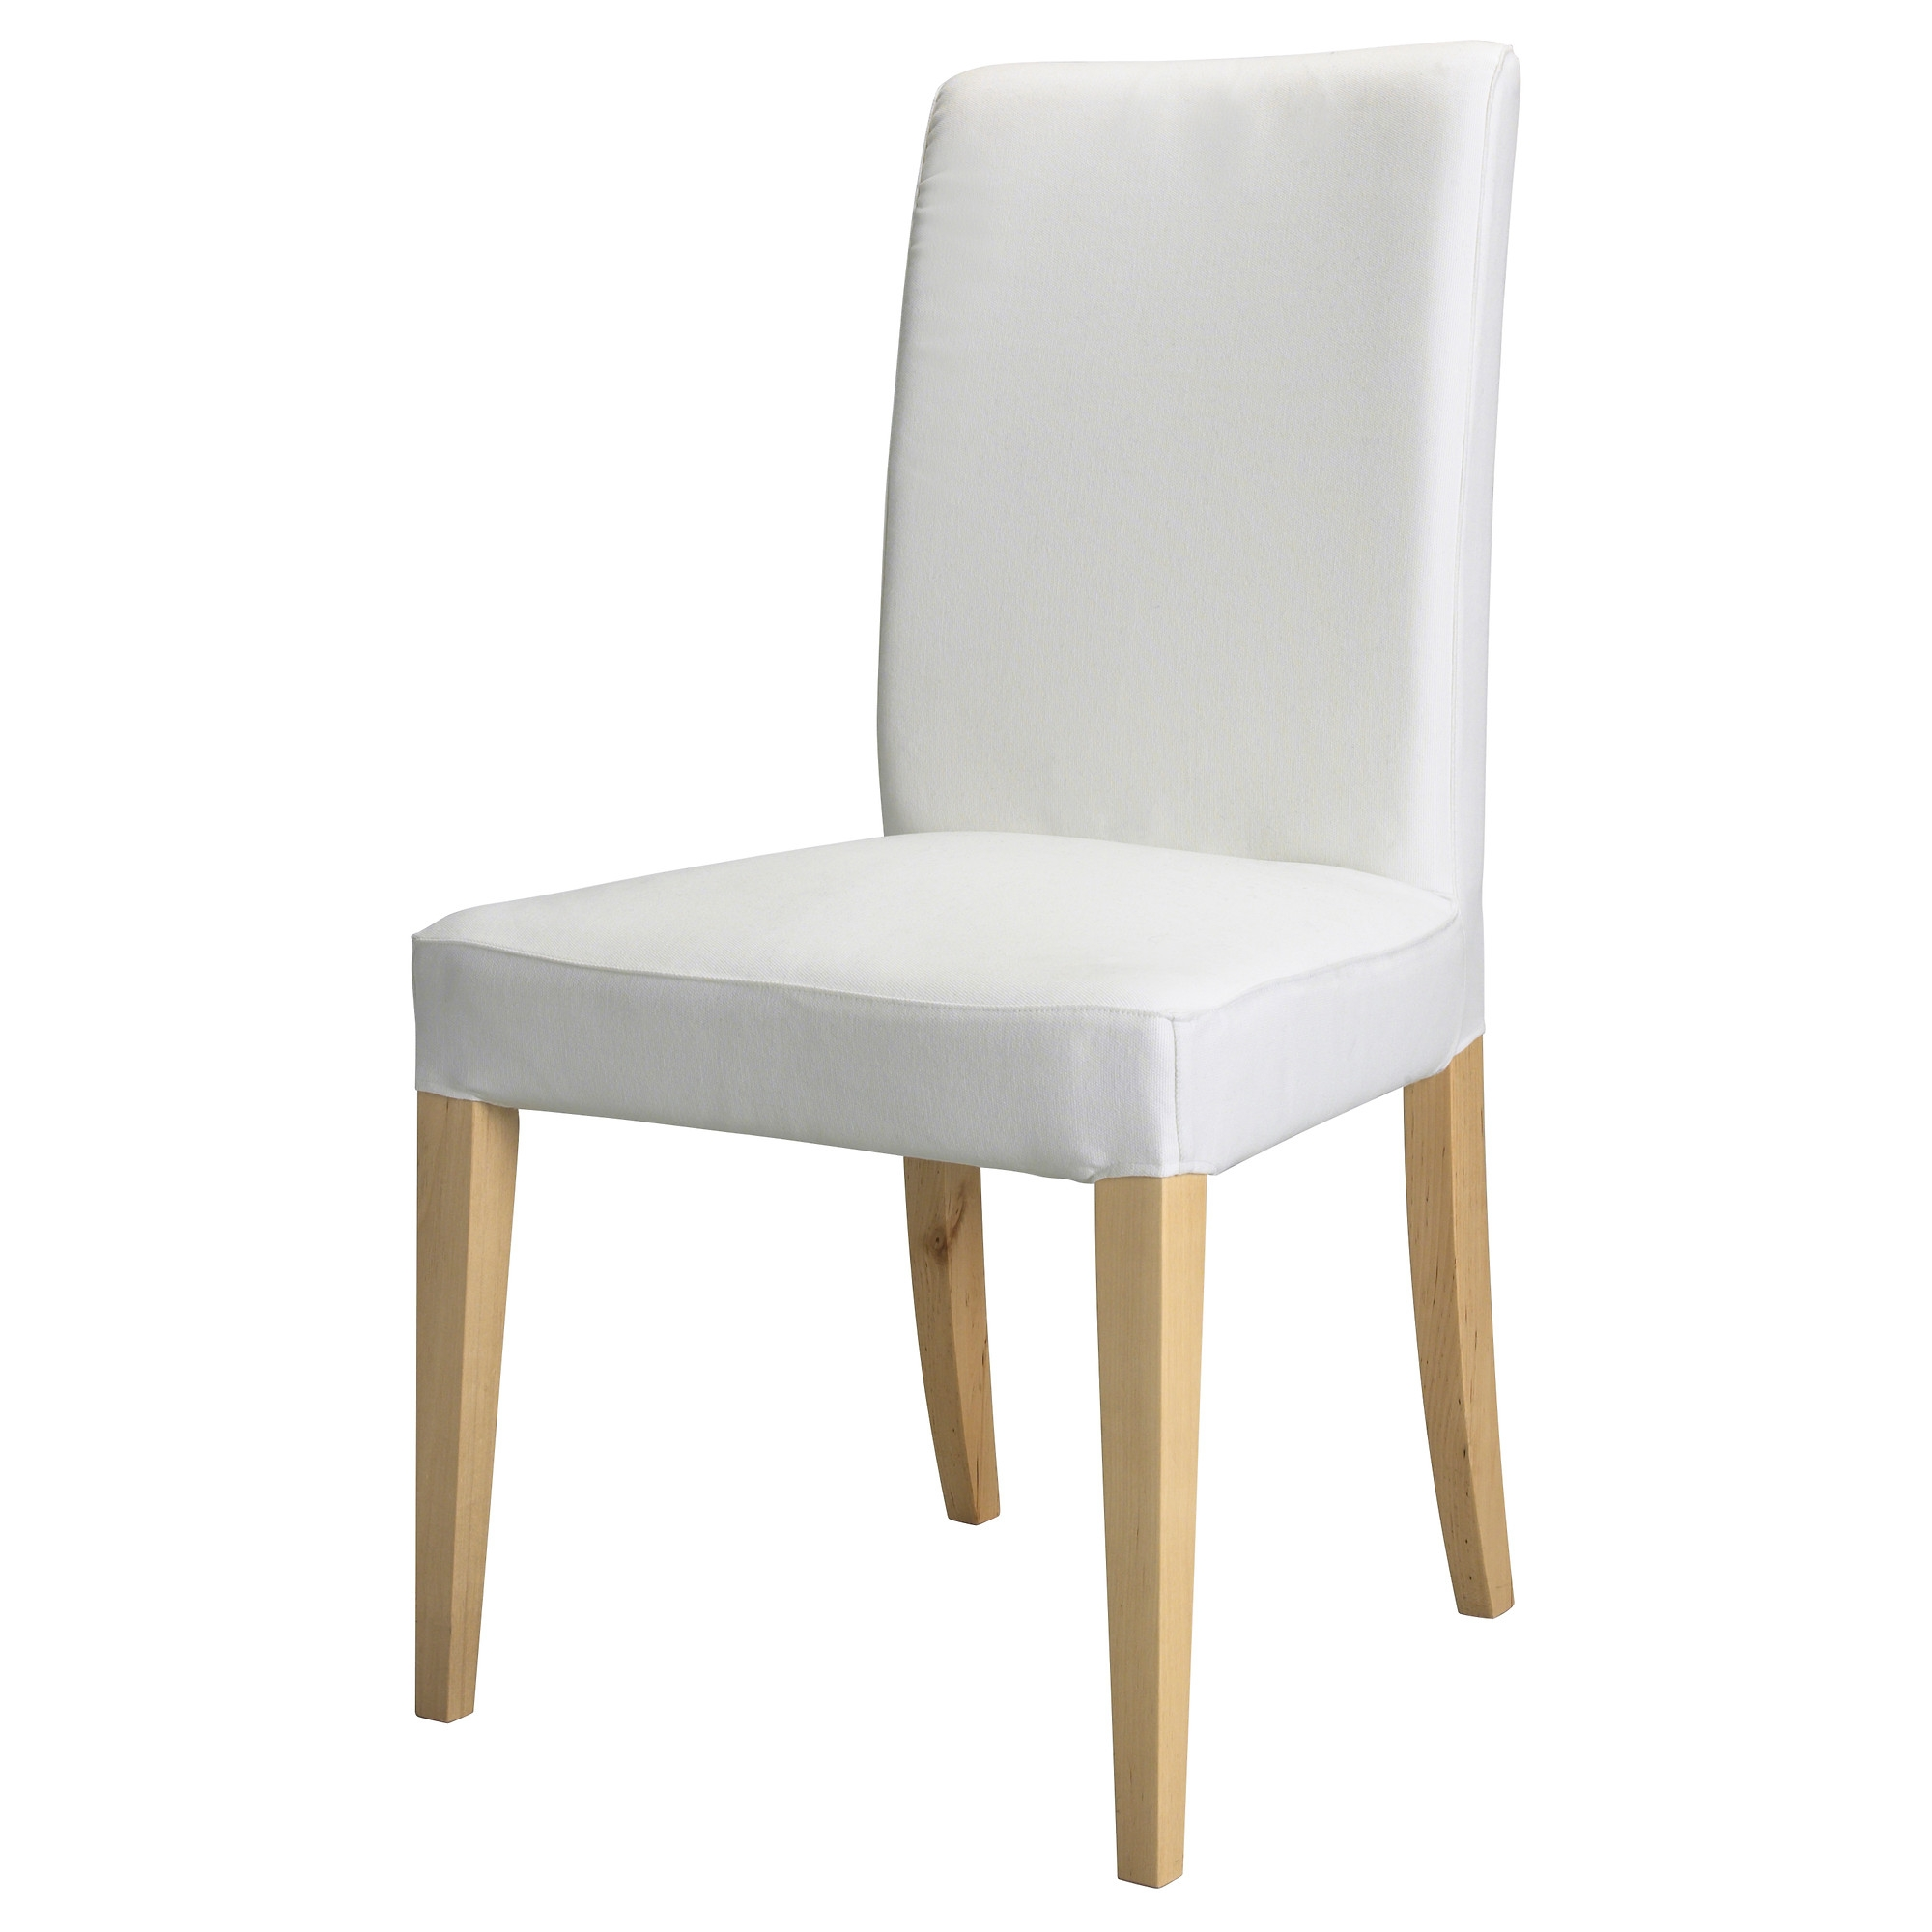 Henriksdal estructura de silla abedul - Sillas habitacion ikea ...